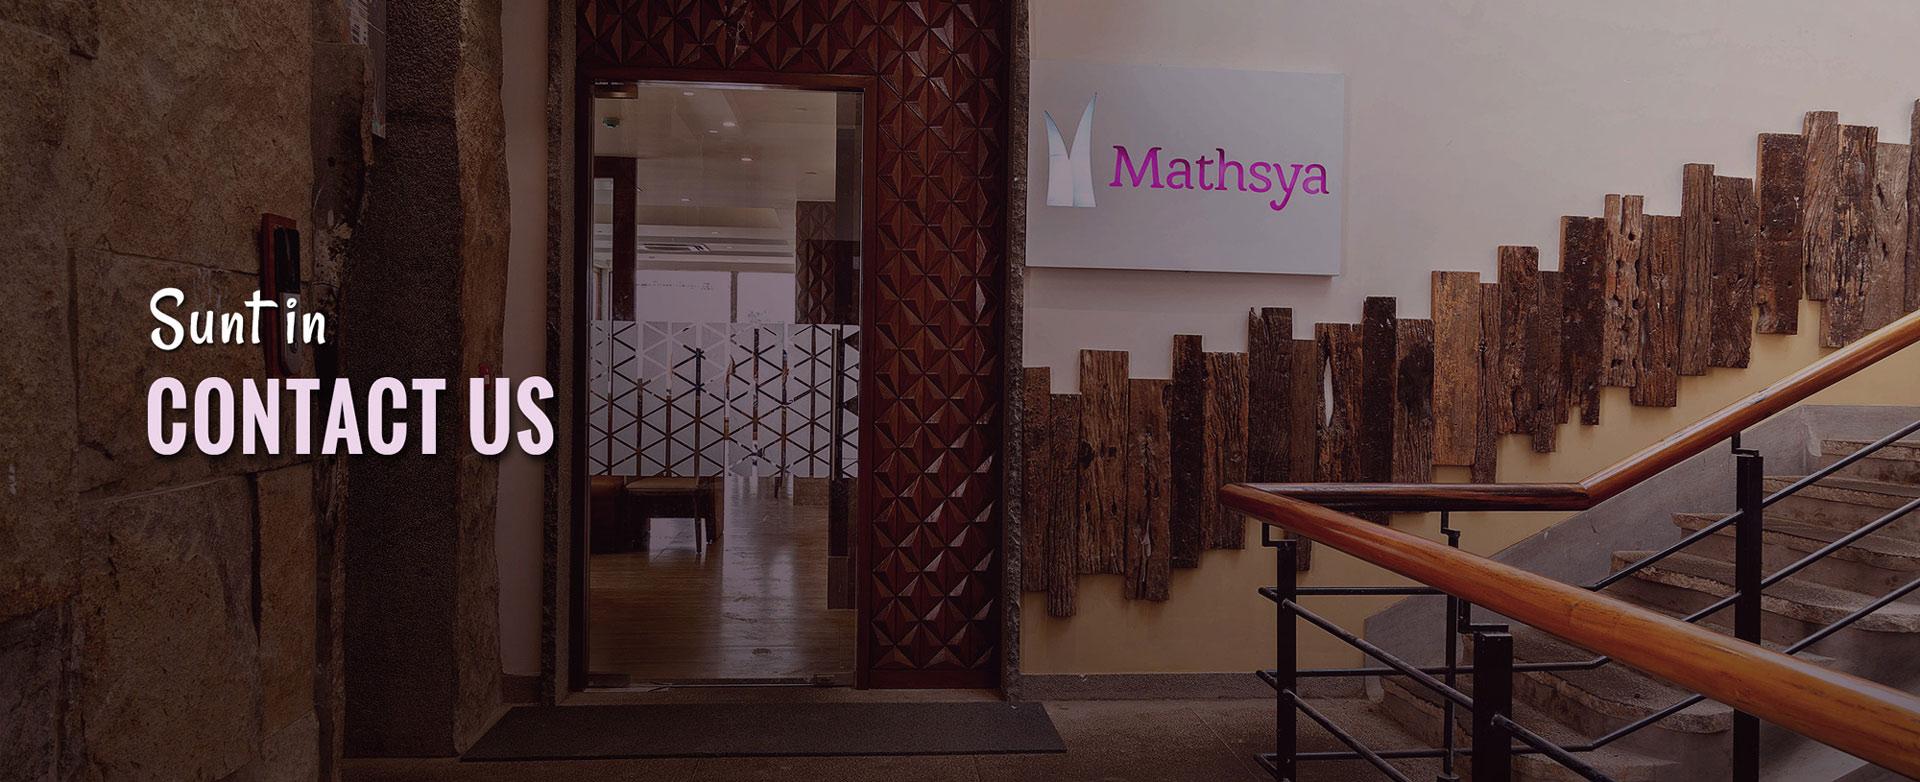 Mathsya Contact